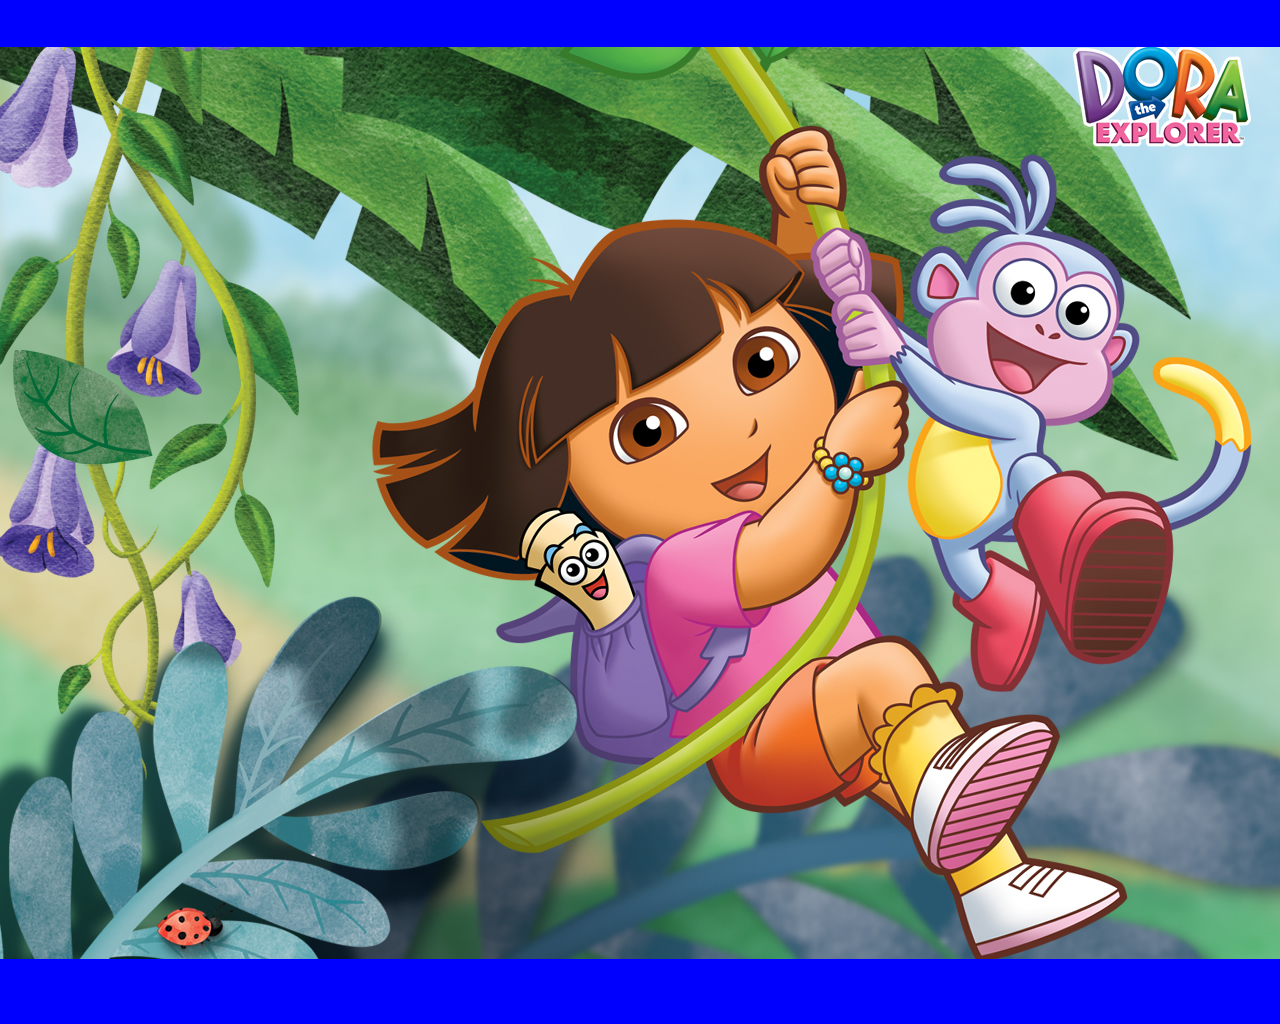 Gambar Mewarnai Dora Dan Boots Mewarnai Gambar